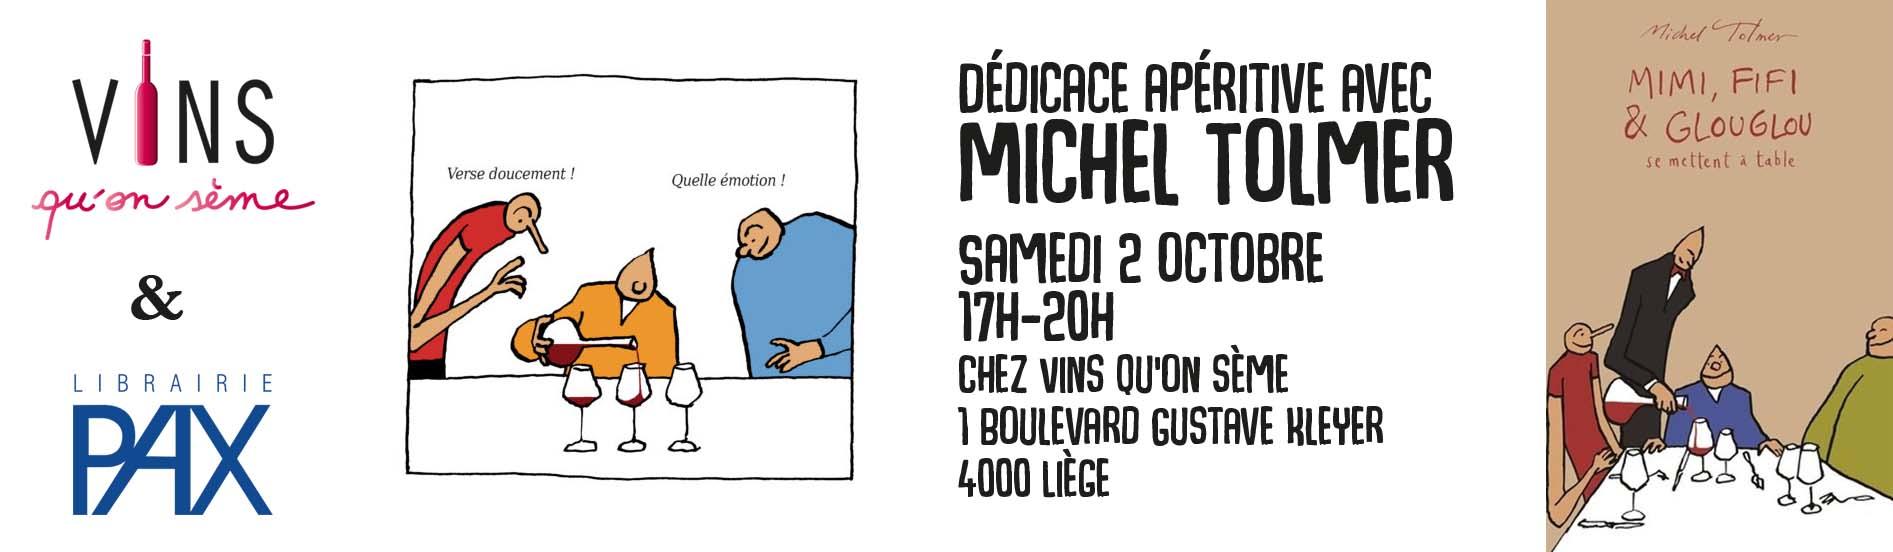 Dedicace apéritive avec Michel Tolmer